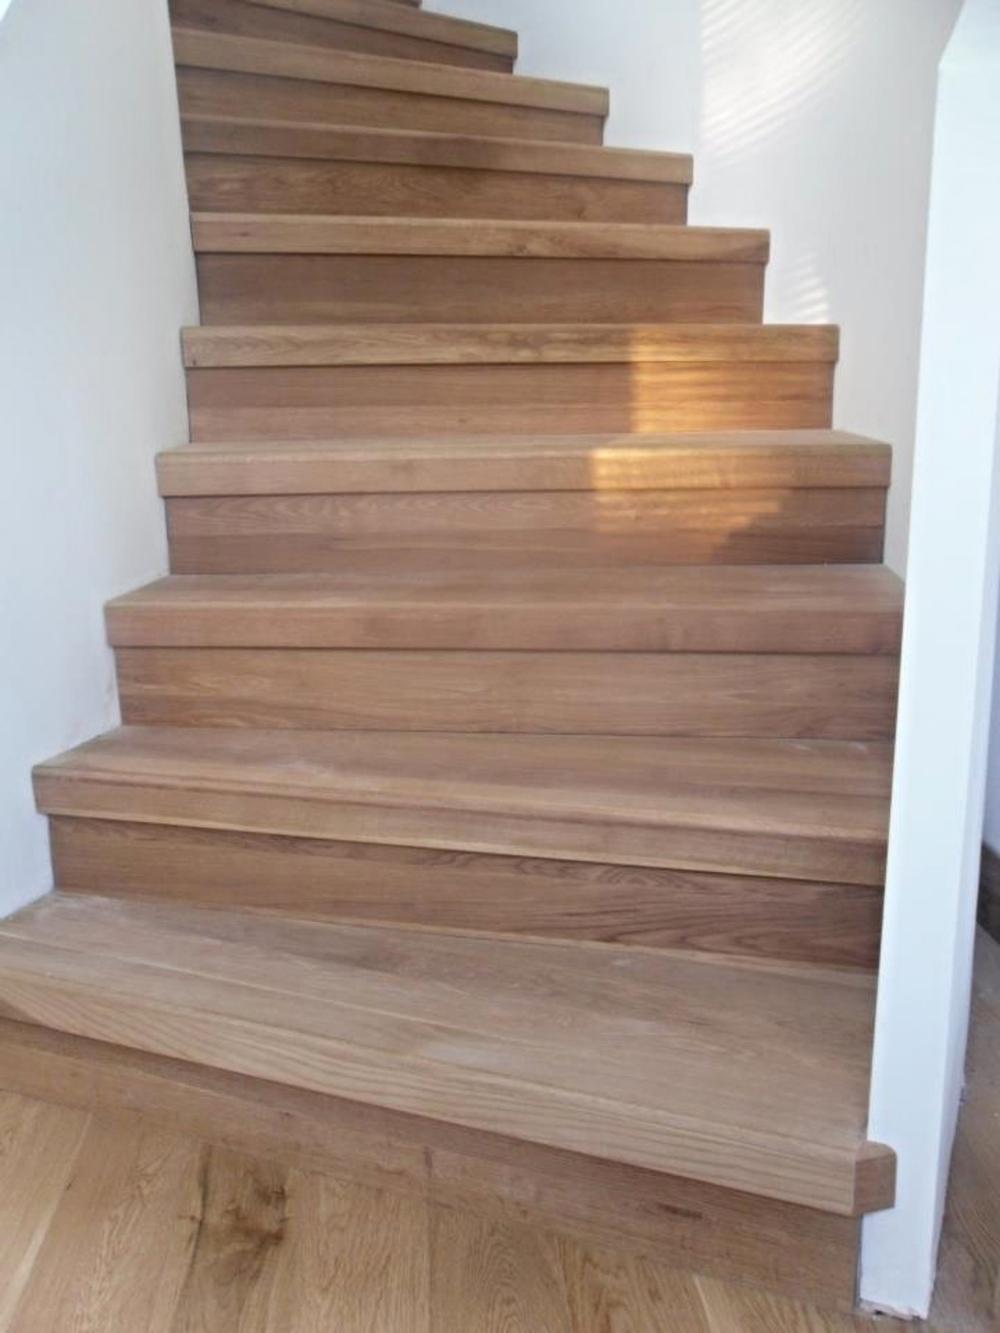 Stair Treads Amp Risers Oak Stair Tread 1000 X 305 Mm